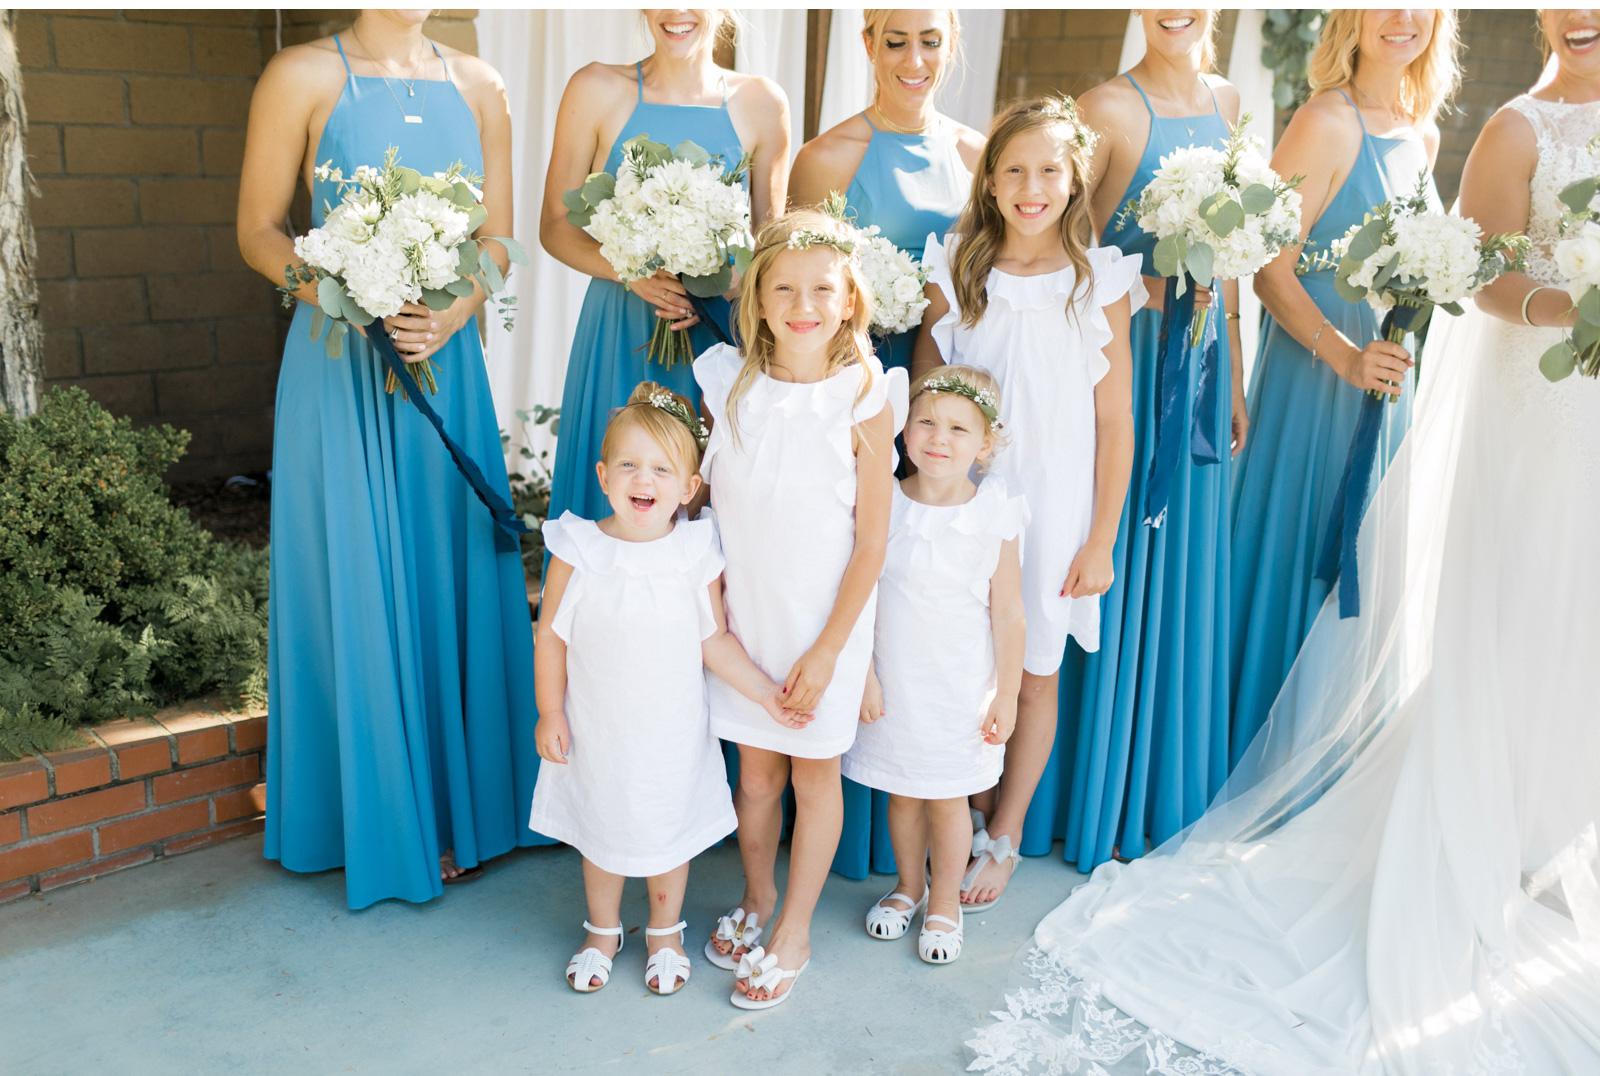 San-Luis-Obispo-Wedding-Photographer-Natalie-Schutt-Photography-Style-Me-Pretty_05.jpg